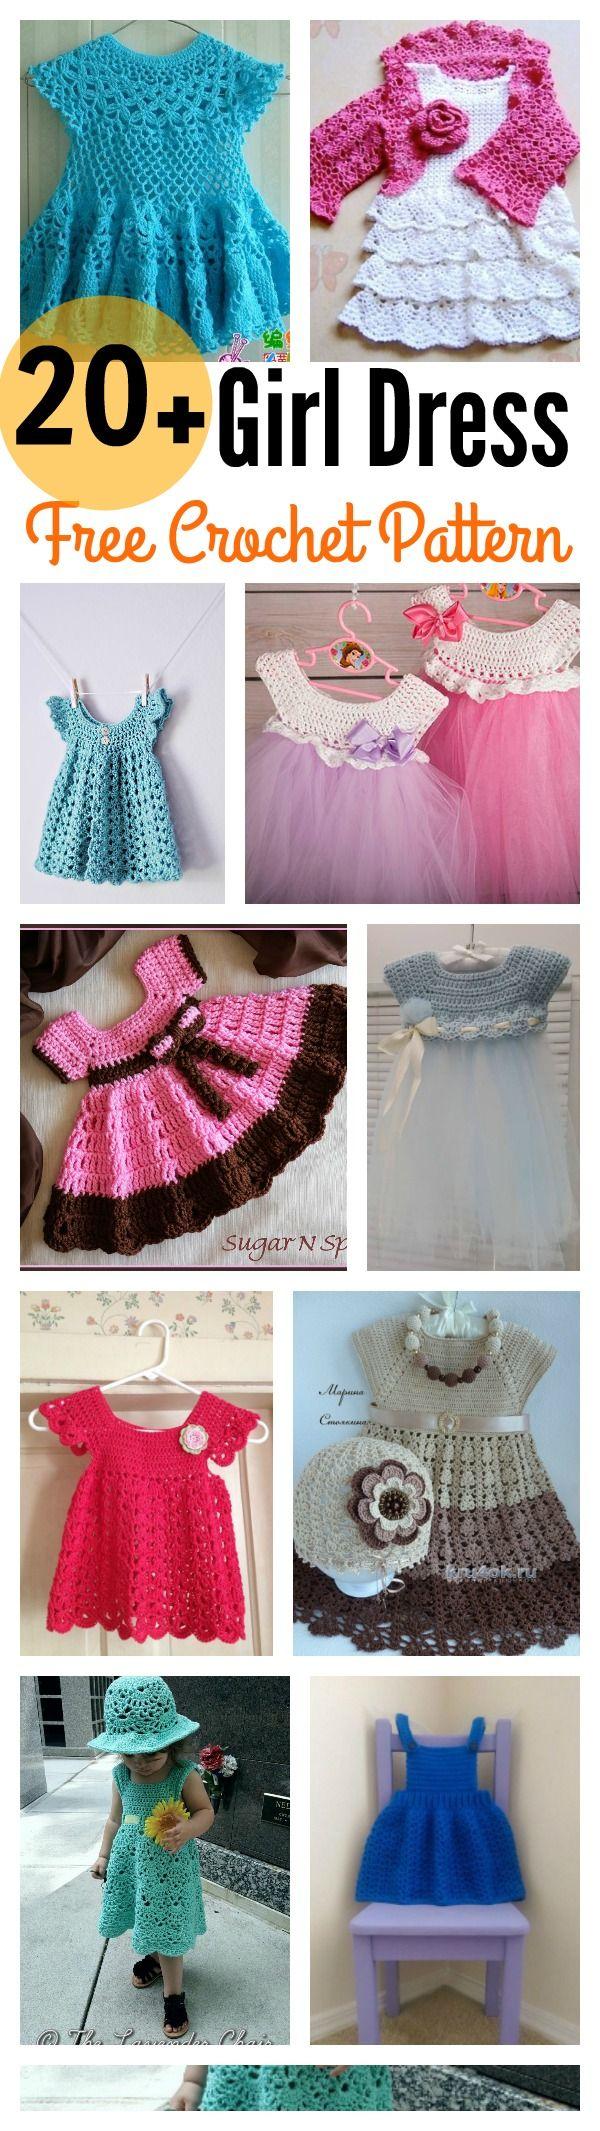 20+ Crochet Girl Dress with Free Pattern | Häkelideen, Strick und Häkeln